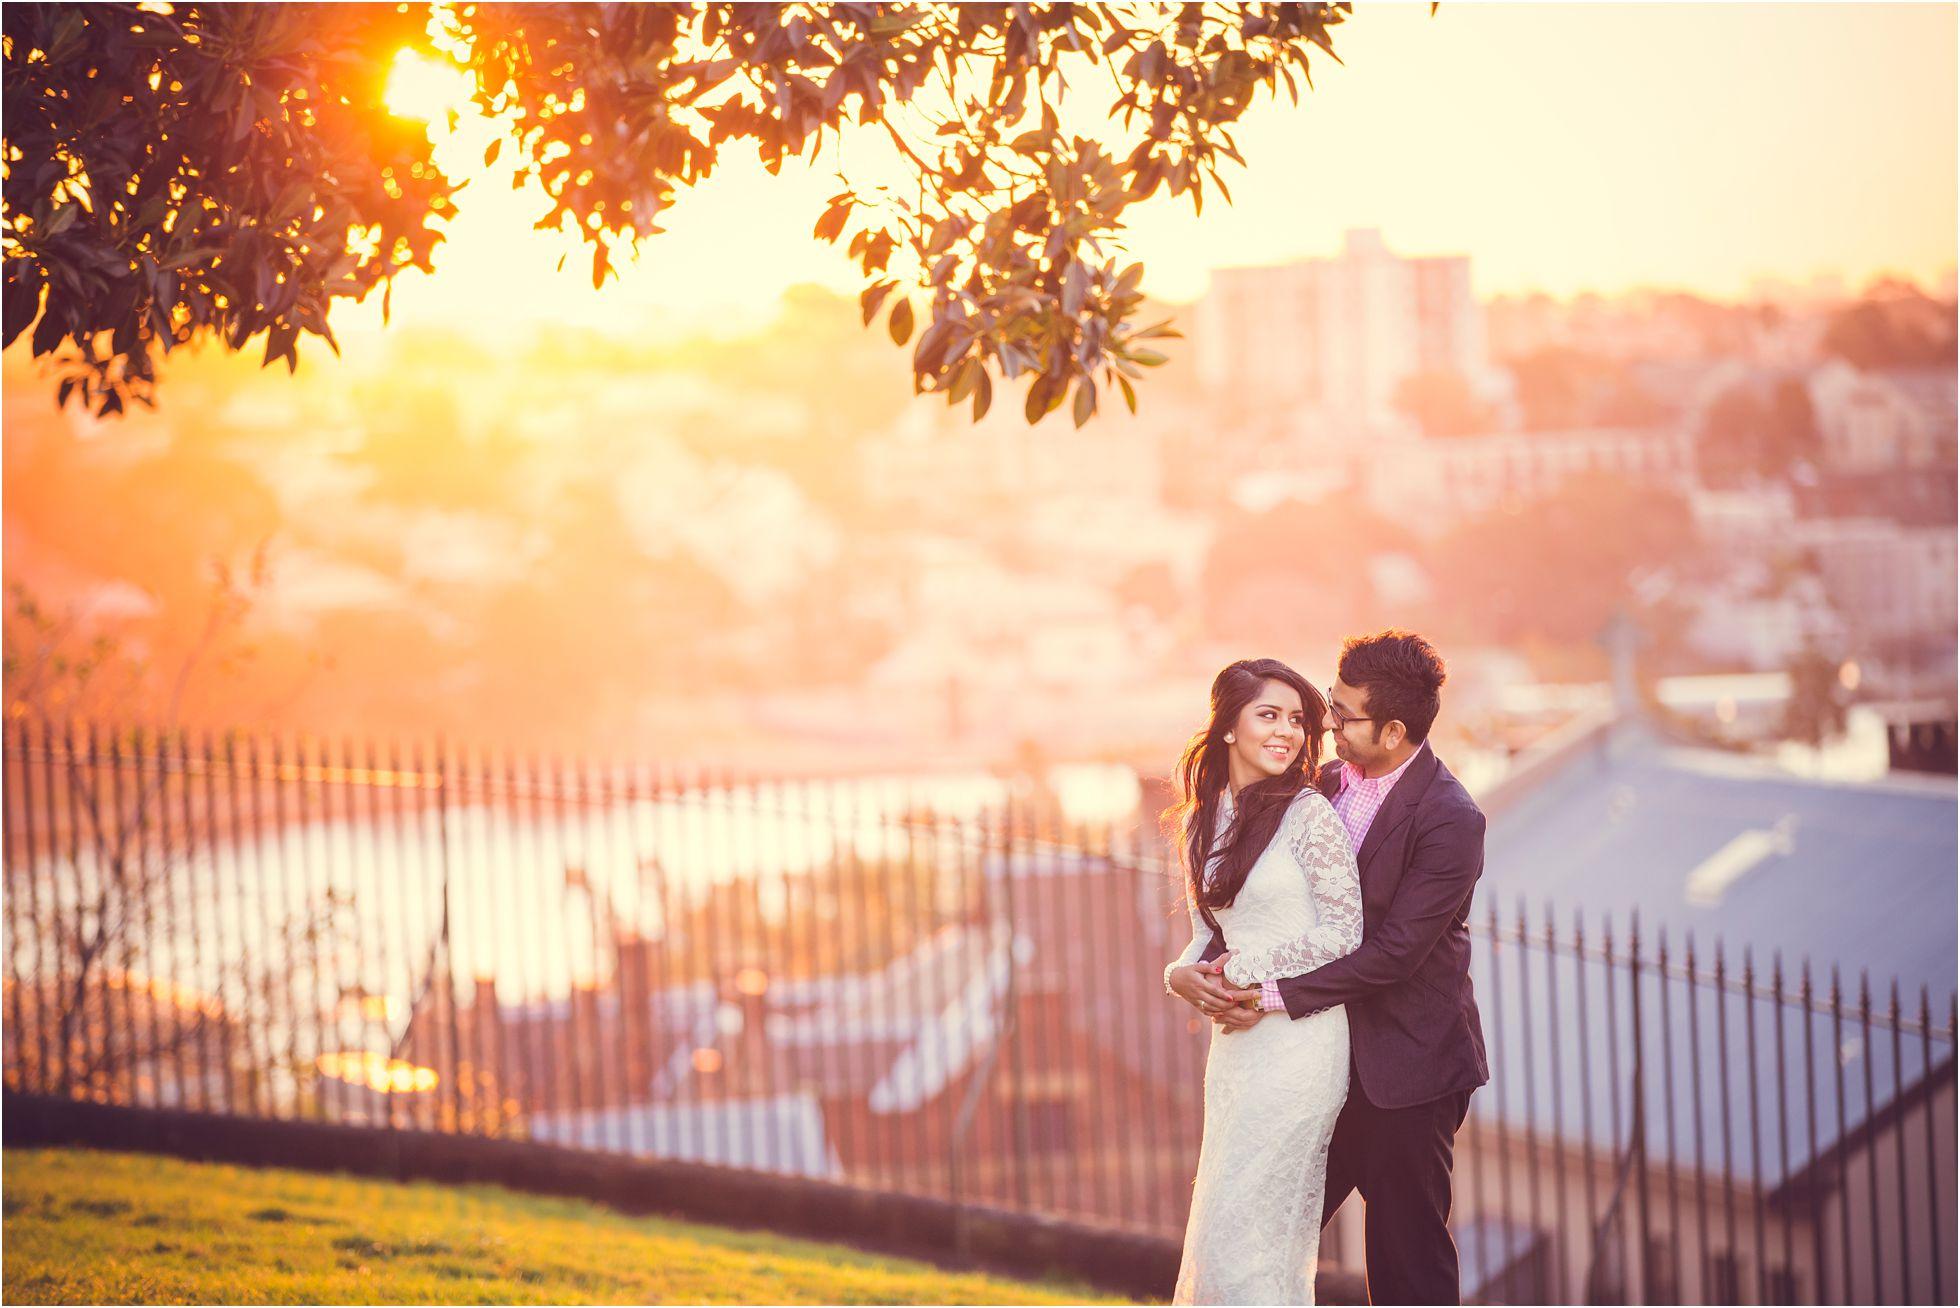 Pre-wedding Photographers in Sydney